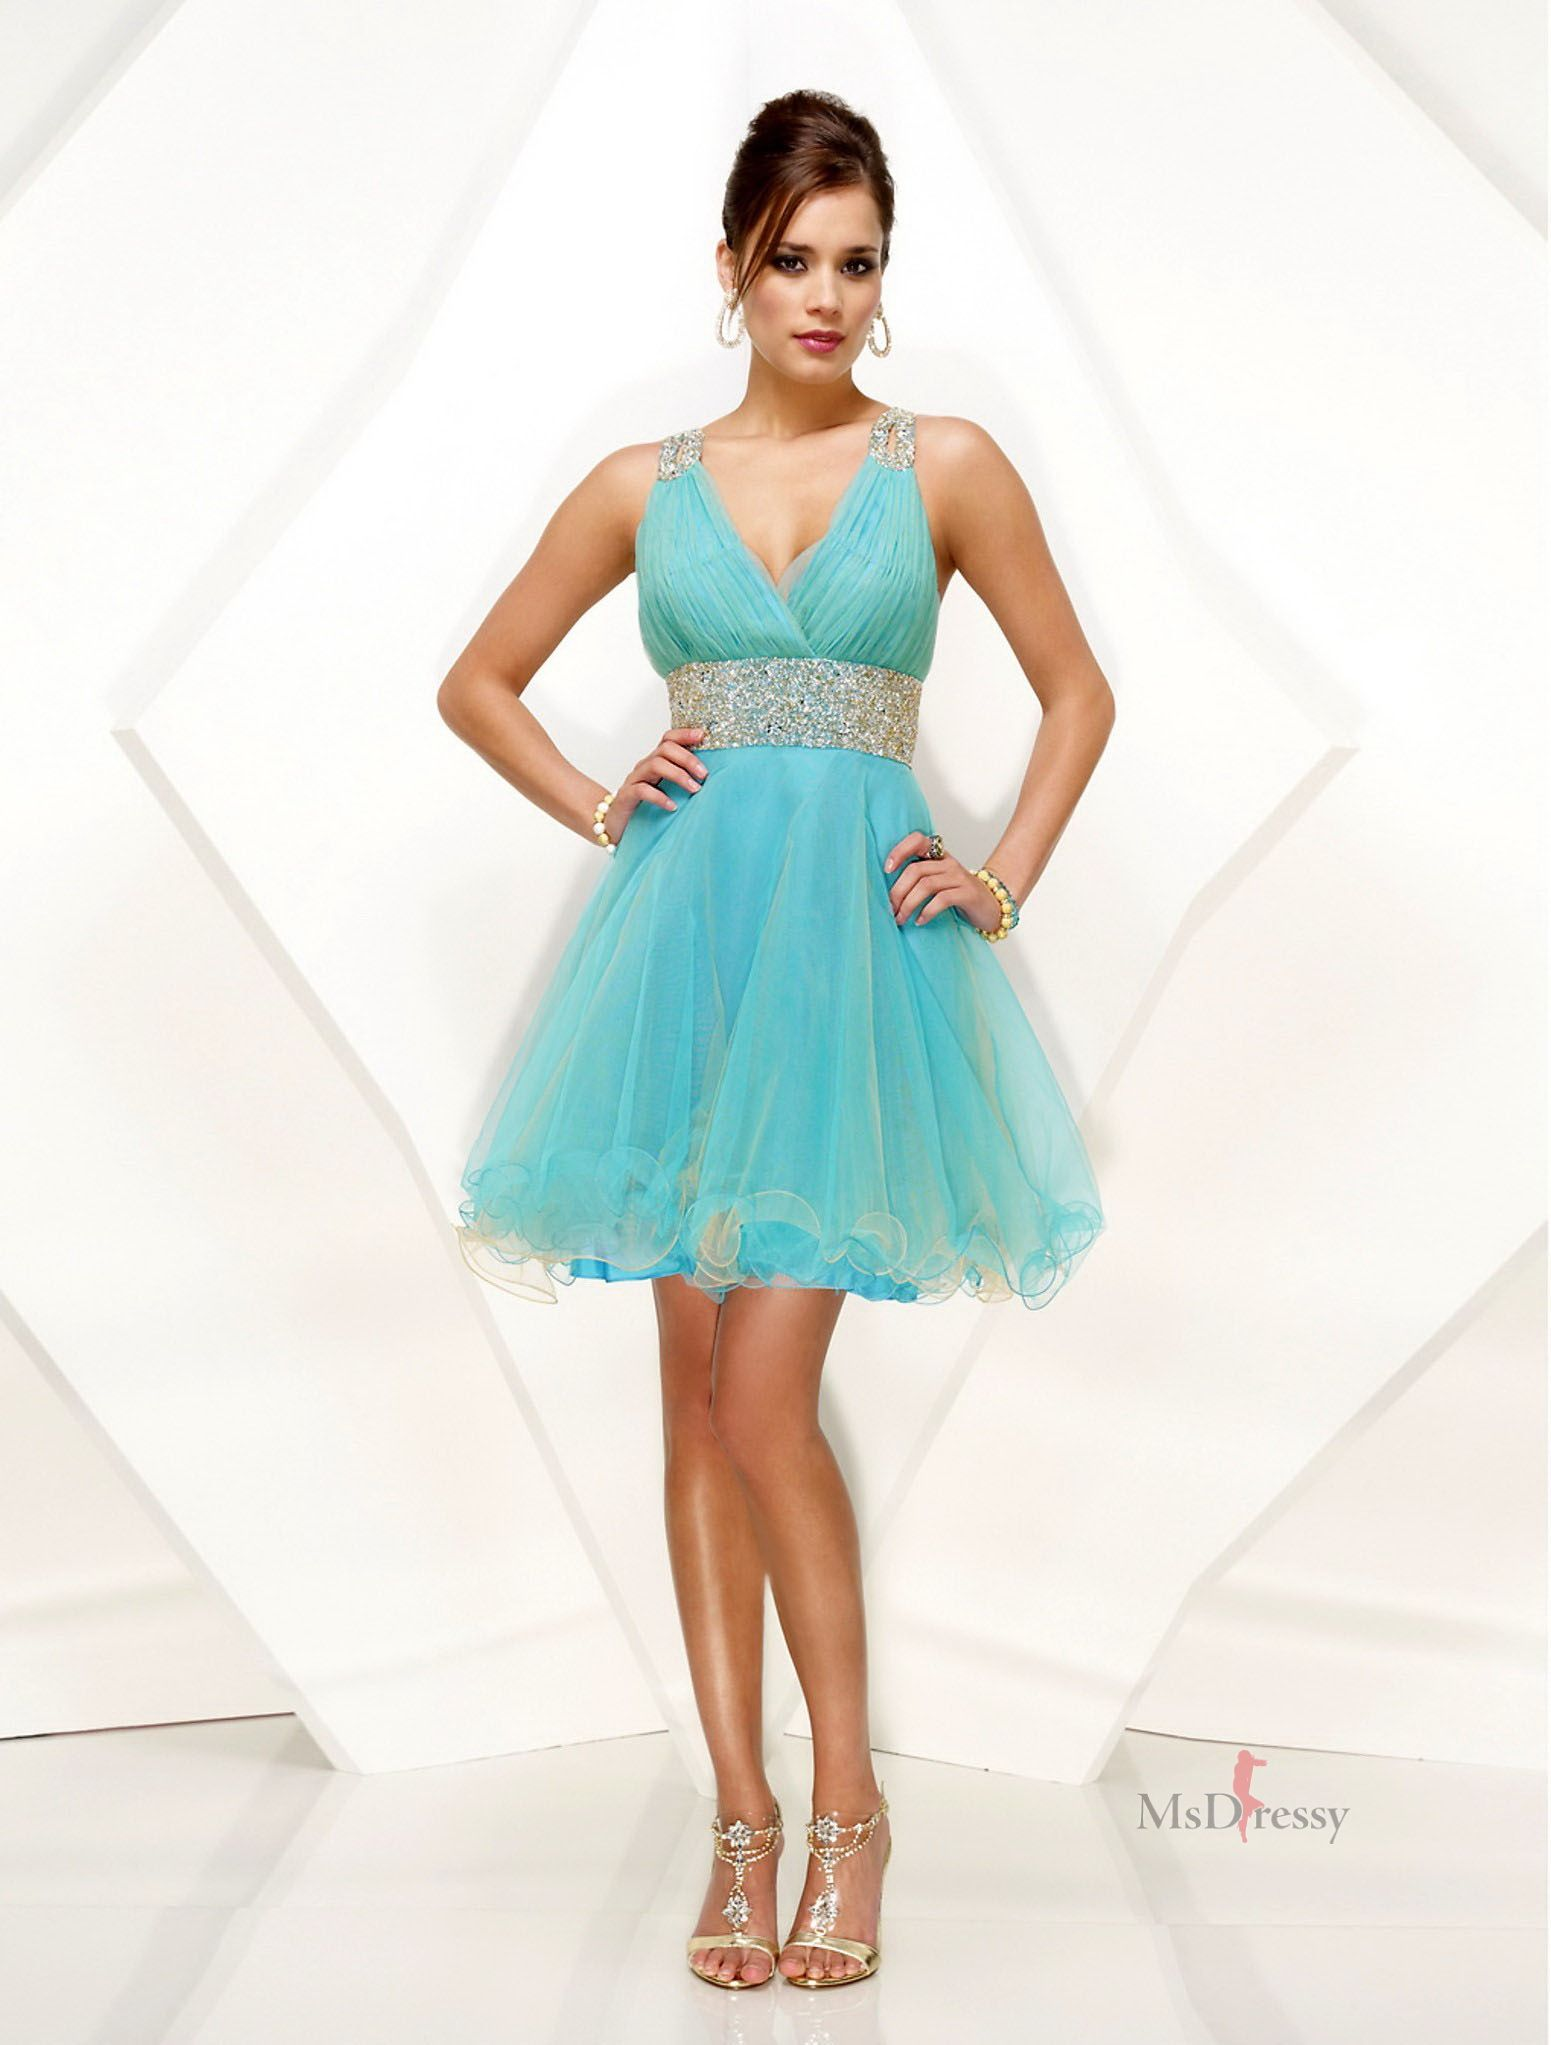 V-neck Tulle Dress With Beading | Very Cute Dresses | Pinterest ...